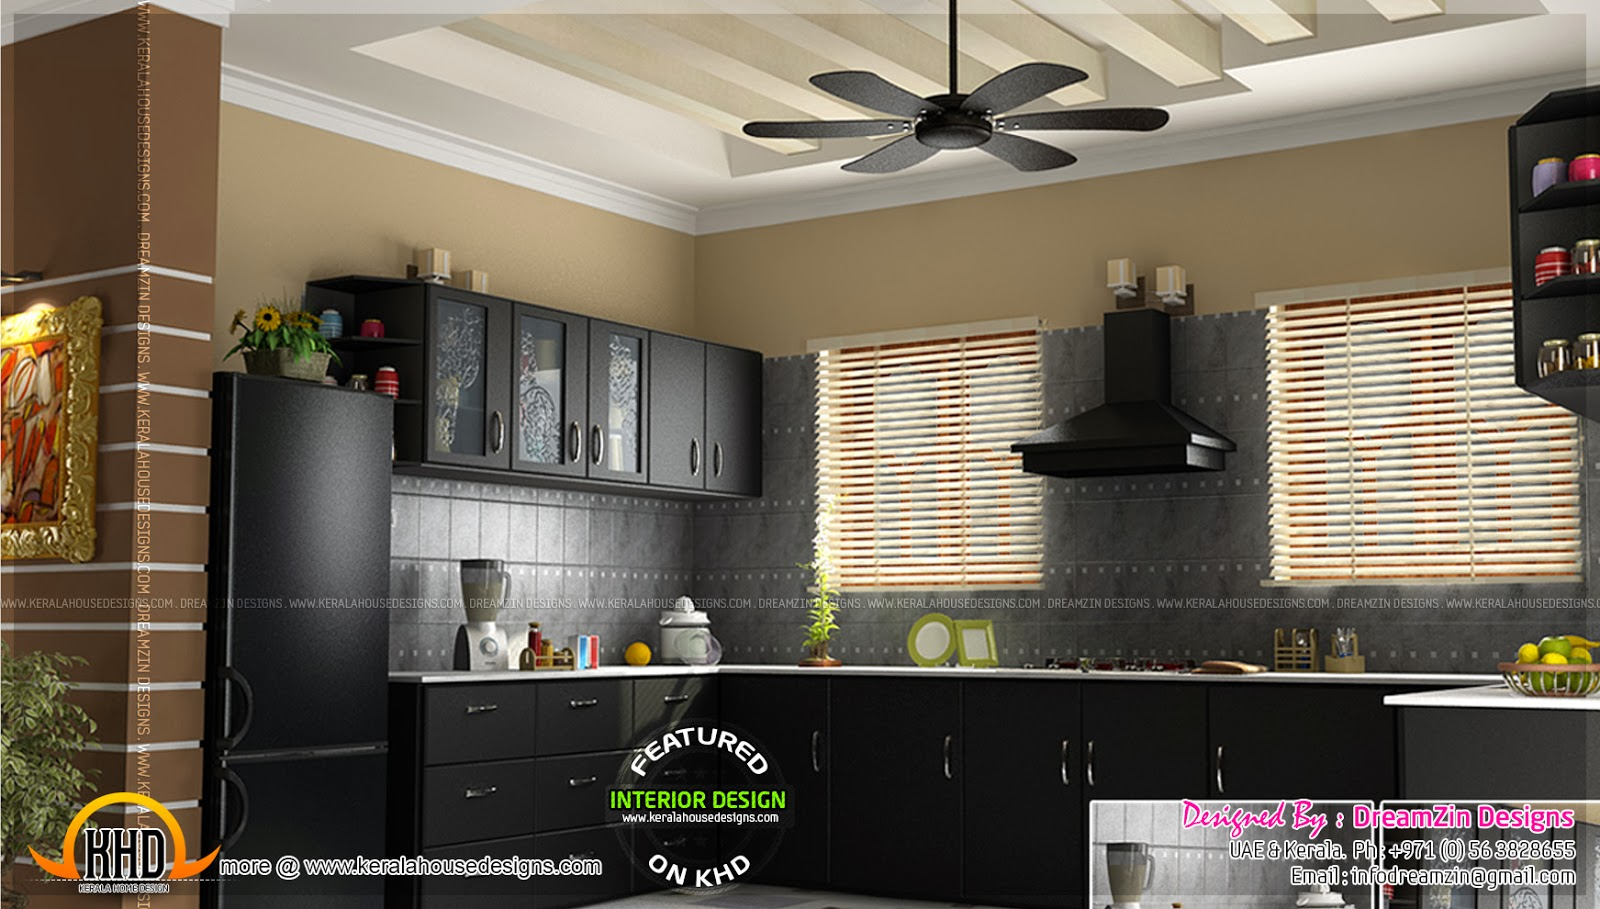 kitchen interior dining area design home kerala plans kitchen interiors modular kitchens chennai chennai interior